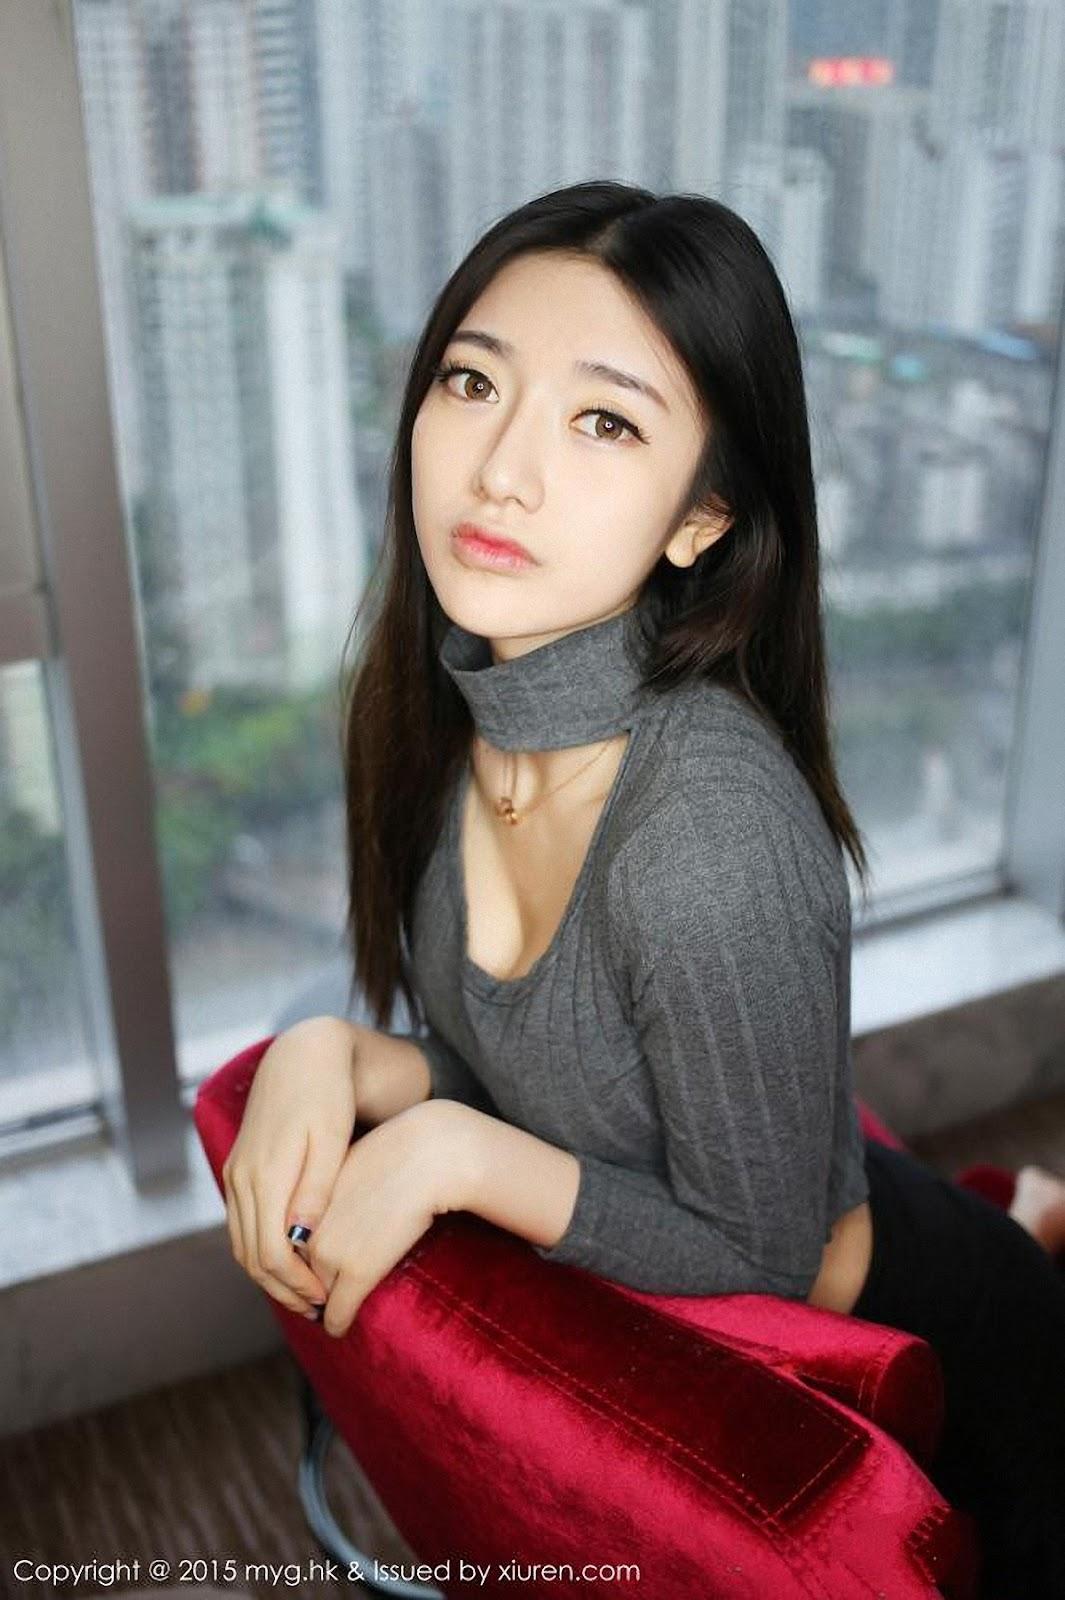 32 - Sexy Girl Model MYGIRL VOL.119